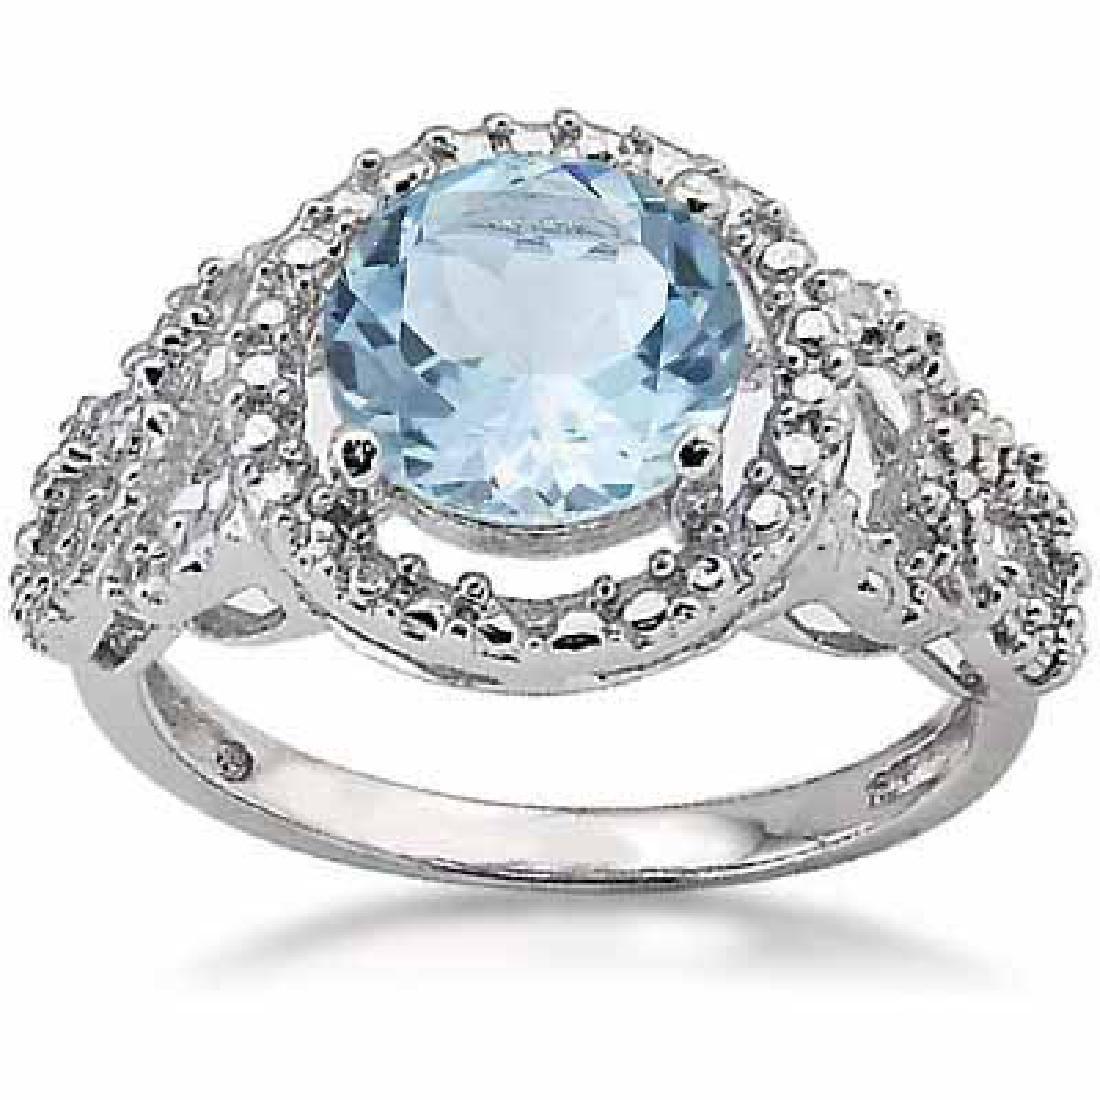 2 1/5 CARAT BABY SWISS BLUE TOPAZ & DIAMOND 925 STERLIN